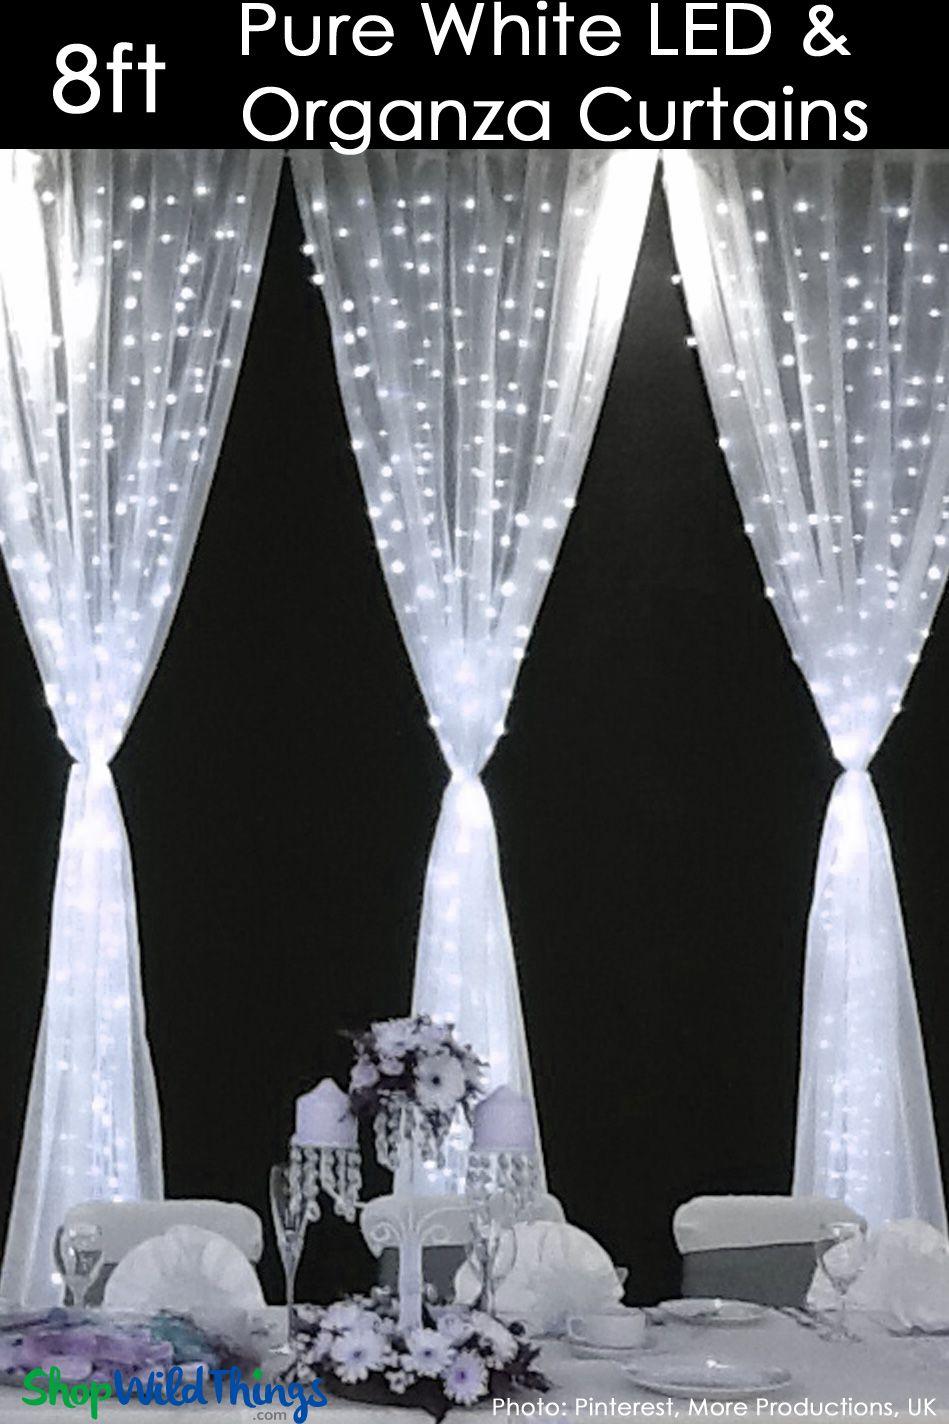 Led Organza Curtain 200 Lights 4 X 8 Pure White Fabric